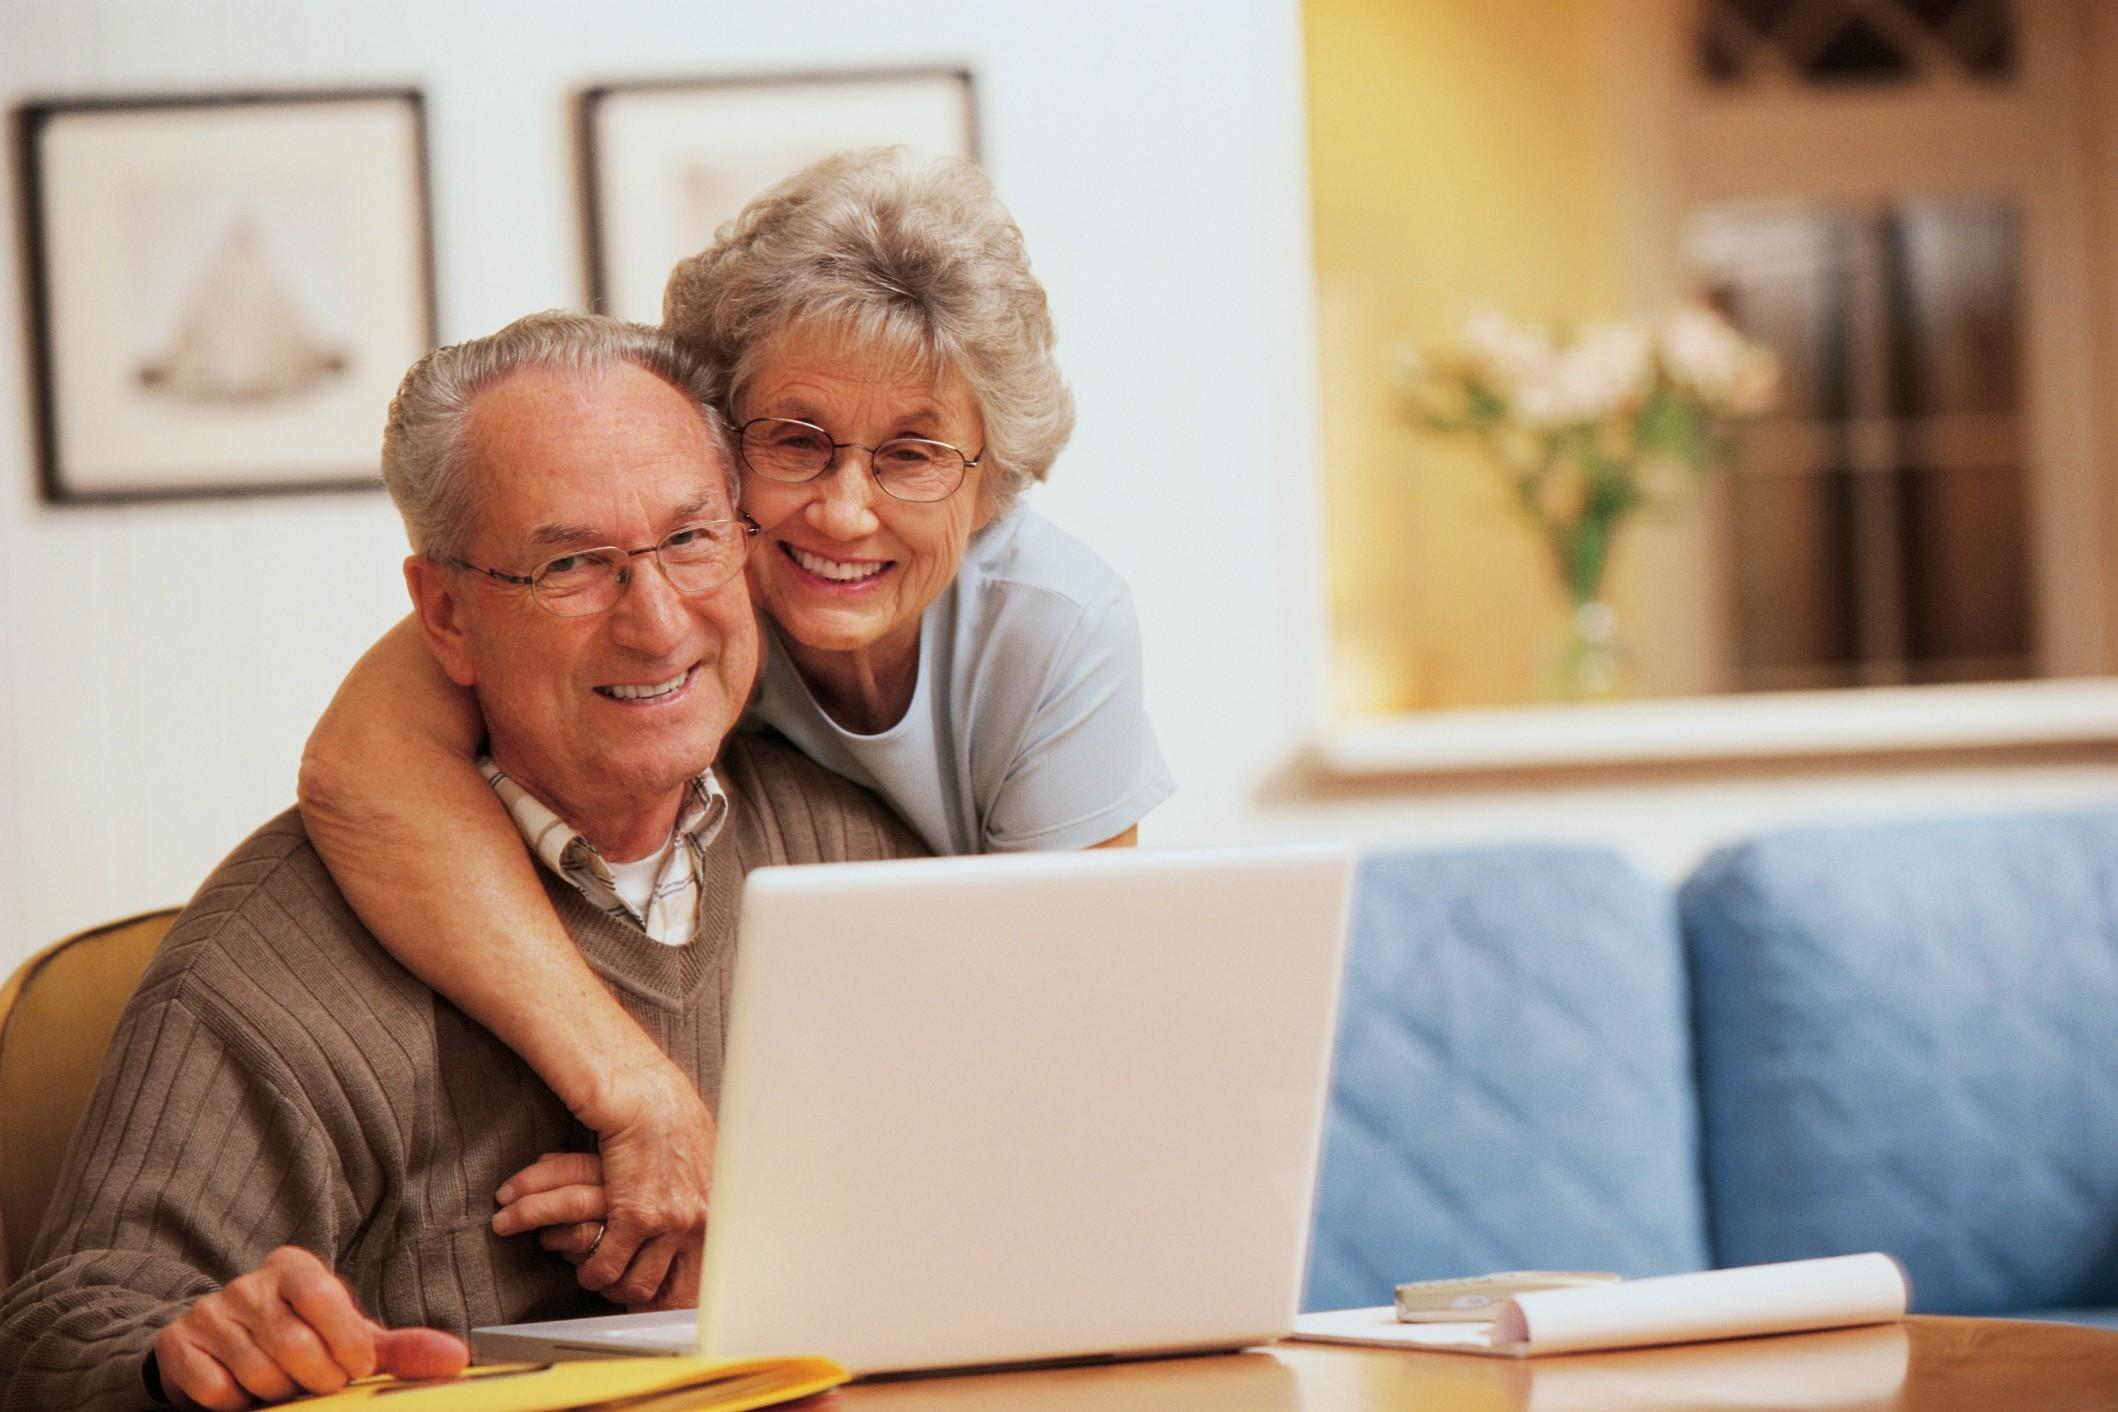 Банки ру кредиты пенсионерам